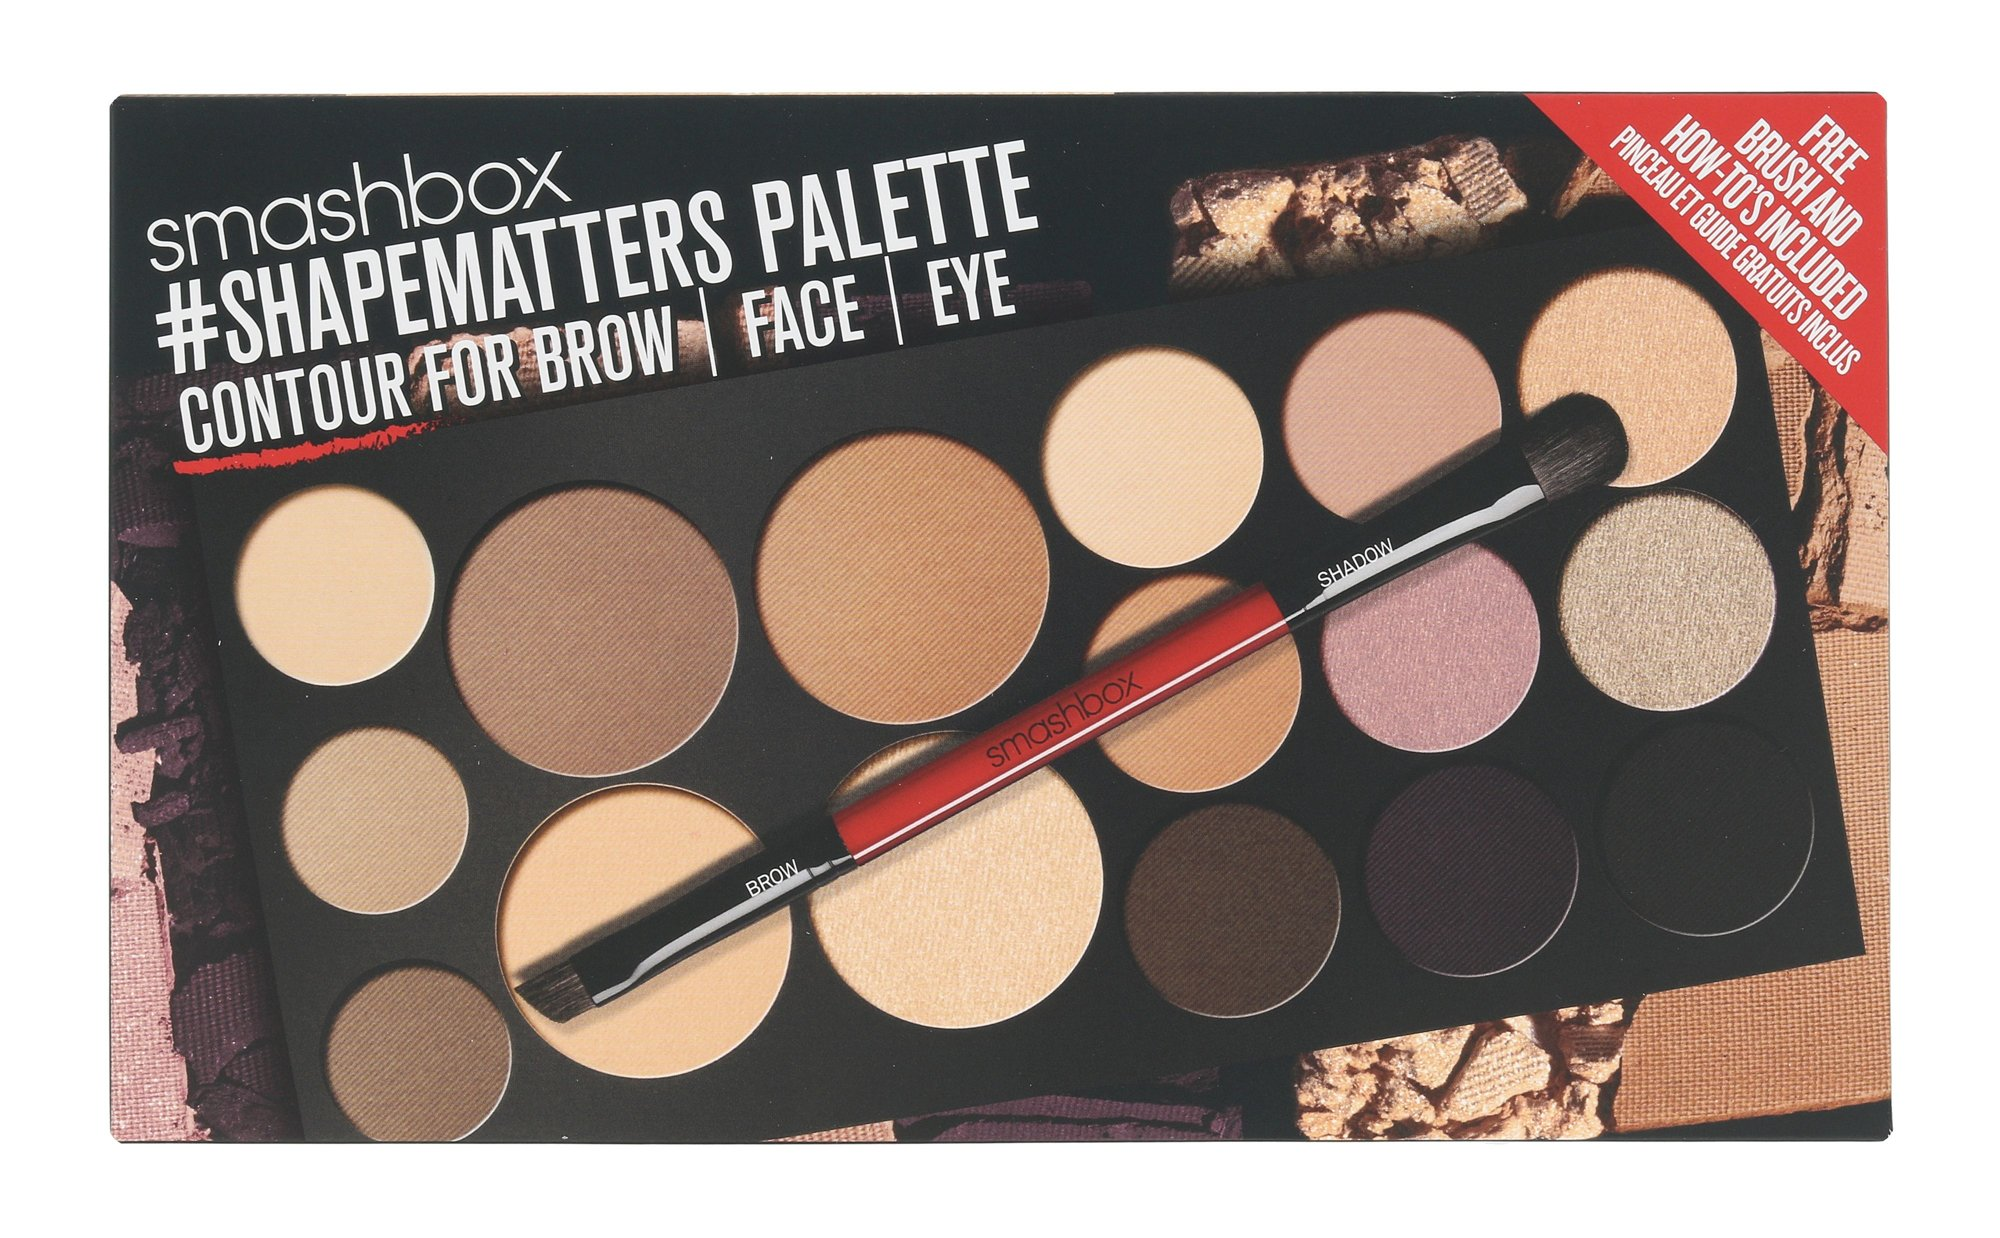 Smashbox Shapematters Palette Cosmetic 30,33ml